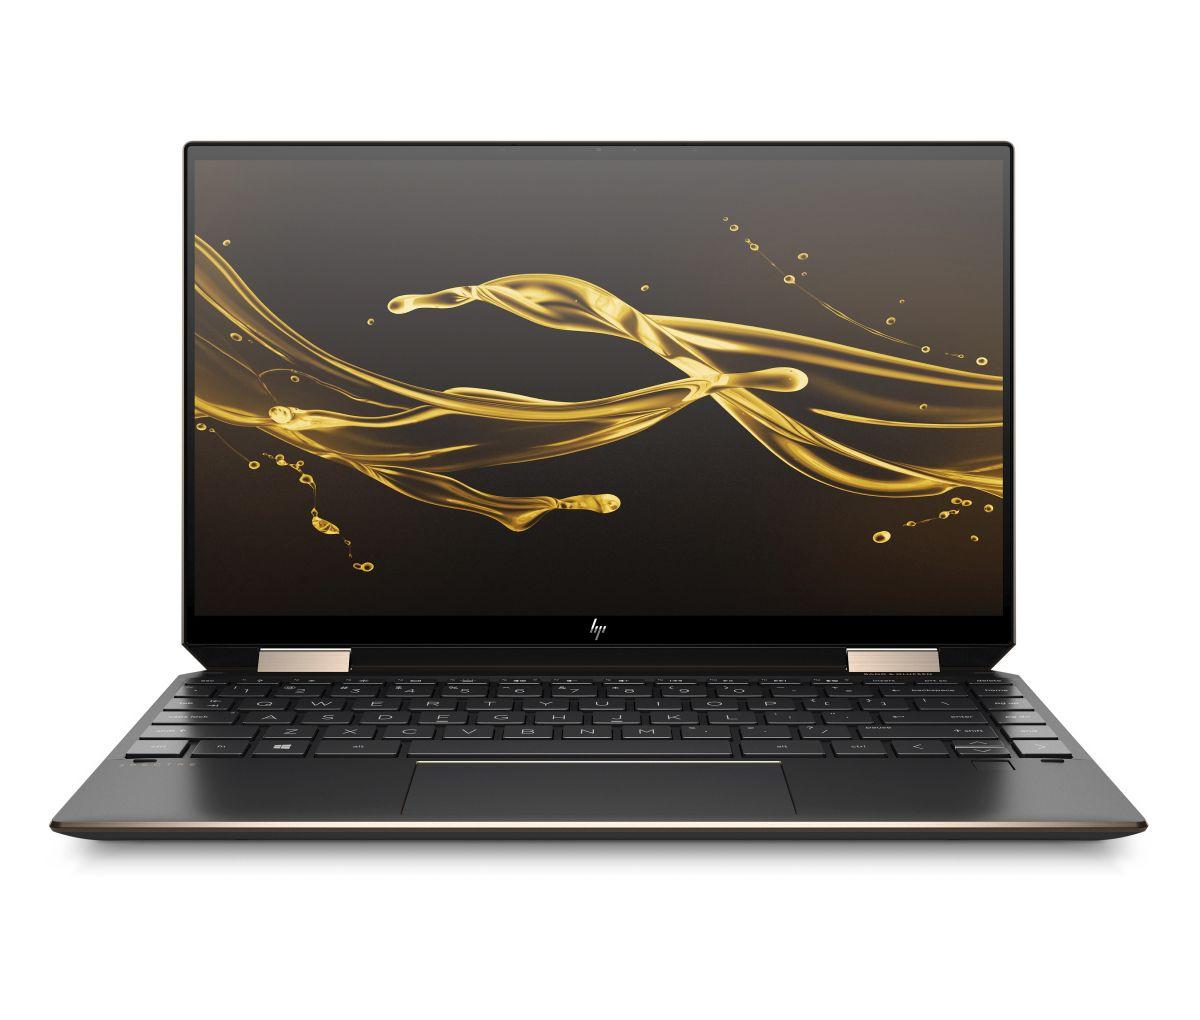 HP x360 Spectre/13-aw0103nc/Rainer19C2/Touch/13,3 FHD BW IPS/Corei7-1065G7/16GB/512 GB+32GB 3D XPOINT/Iris Plus/WIN 10 H